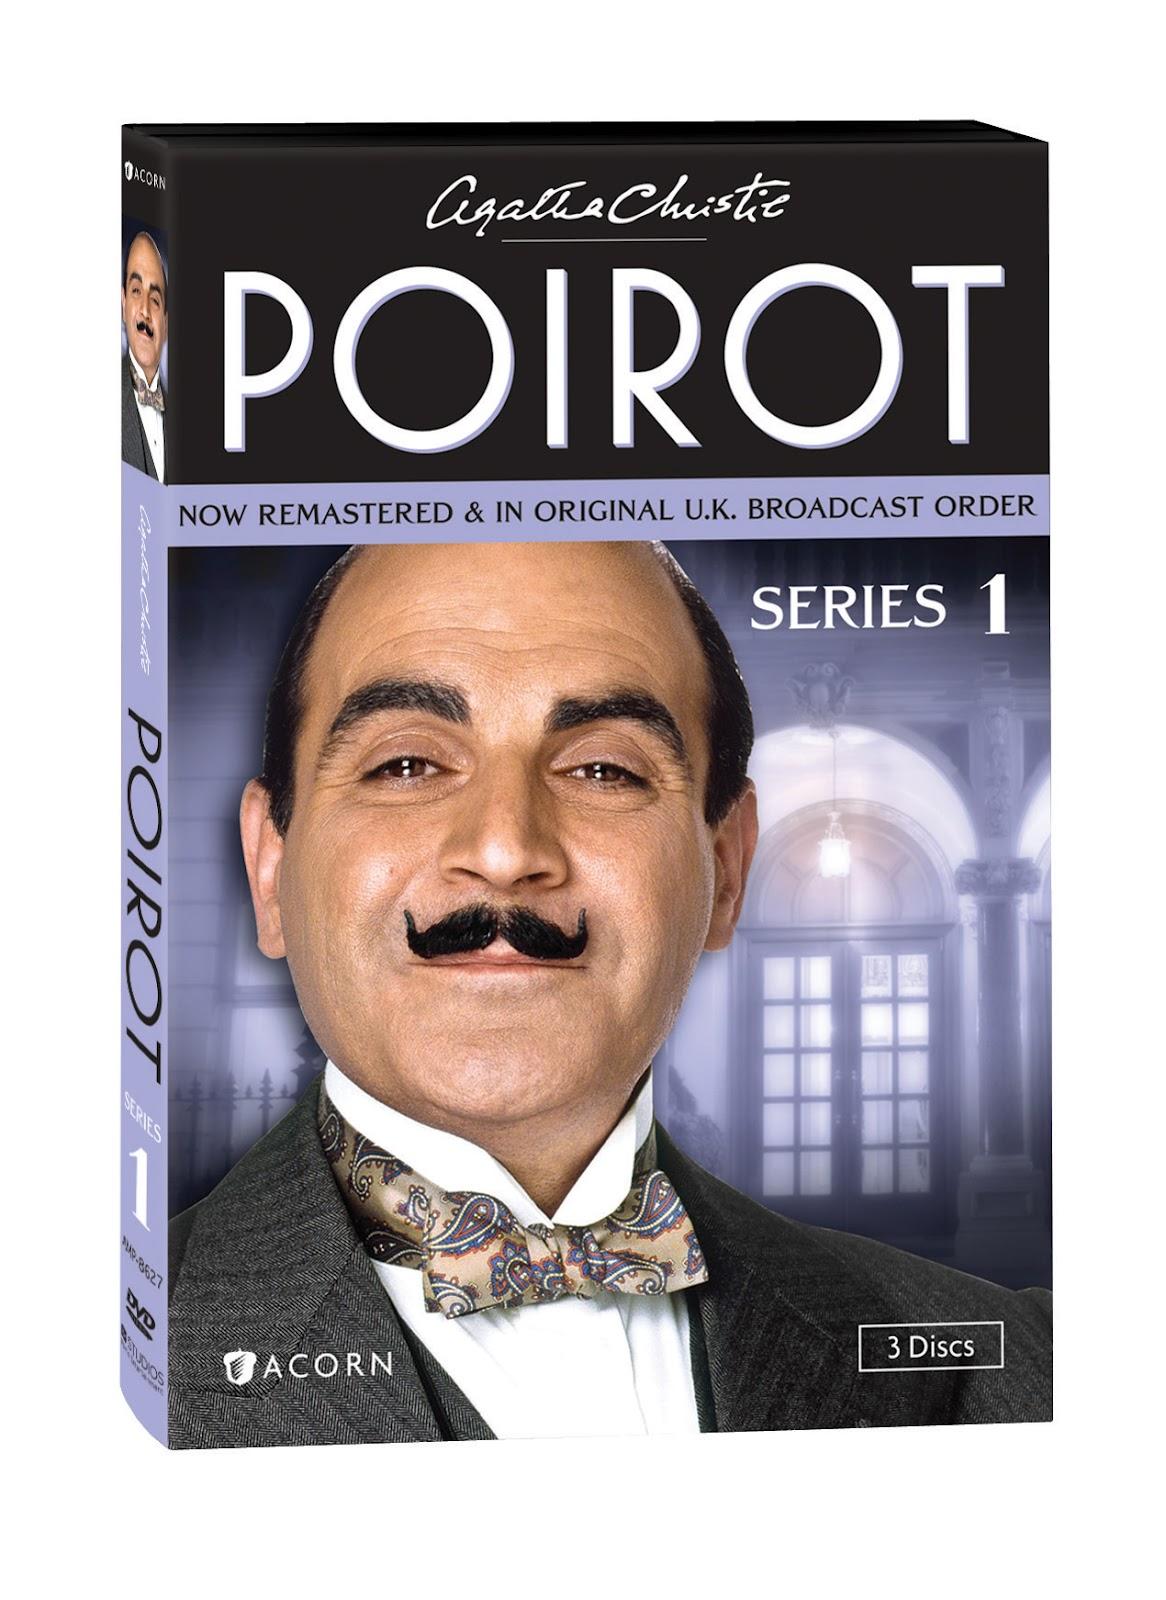 Poirot - Stagione 1  (10/10) [1989],Avi DVDRip ITA/ENG MP3 Xvid